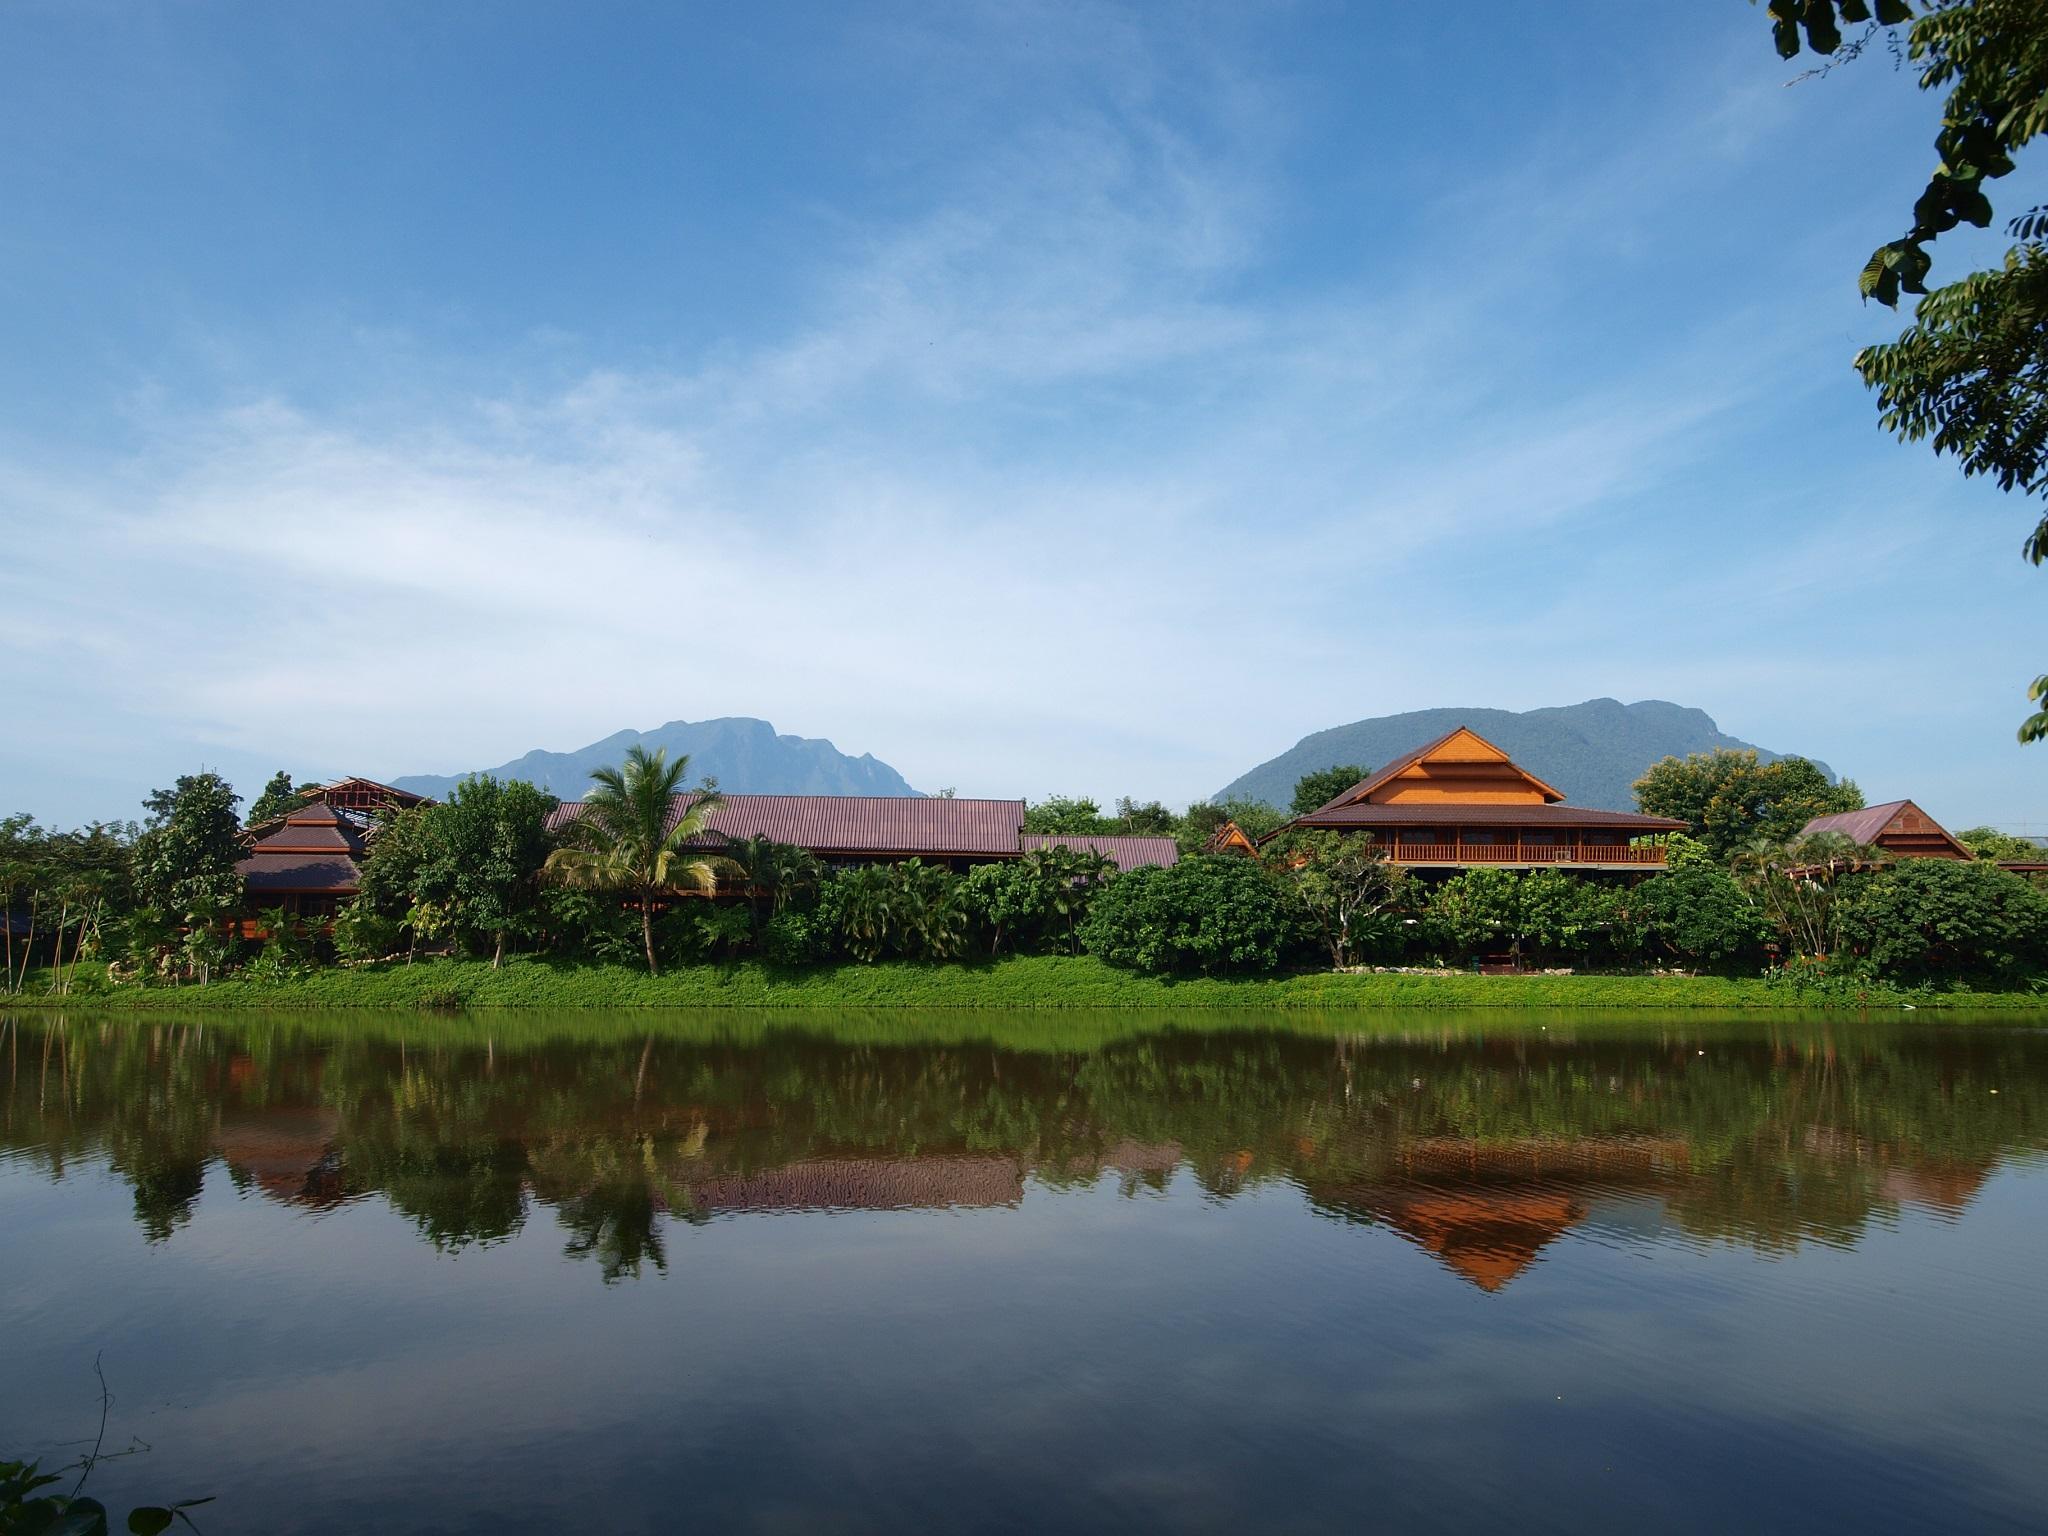 Rim Doi Resort, Chiang Dao